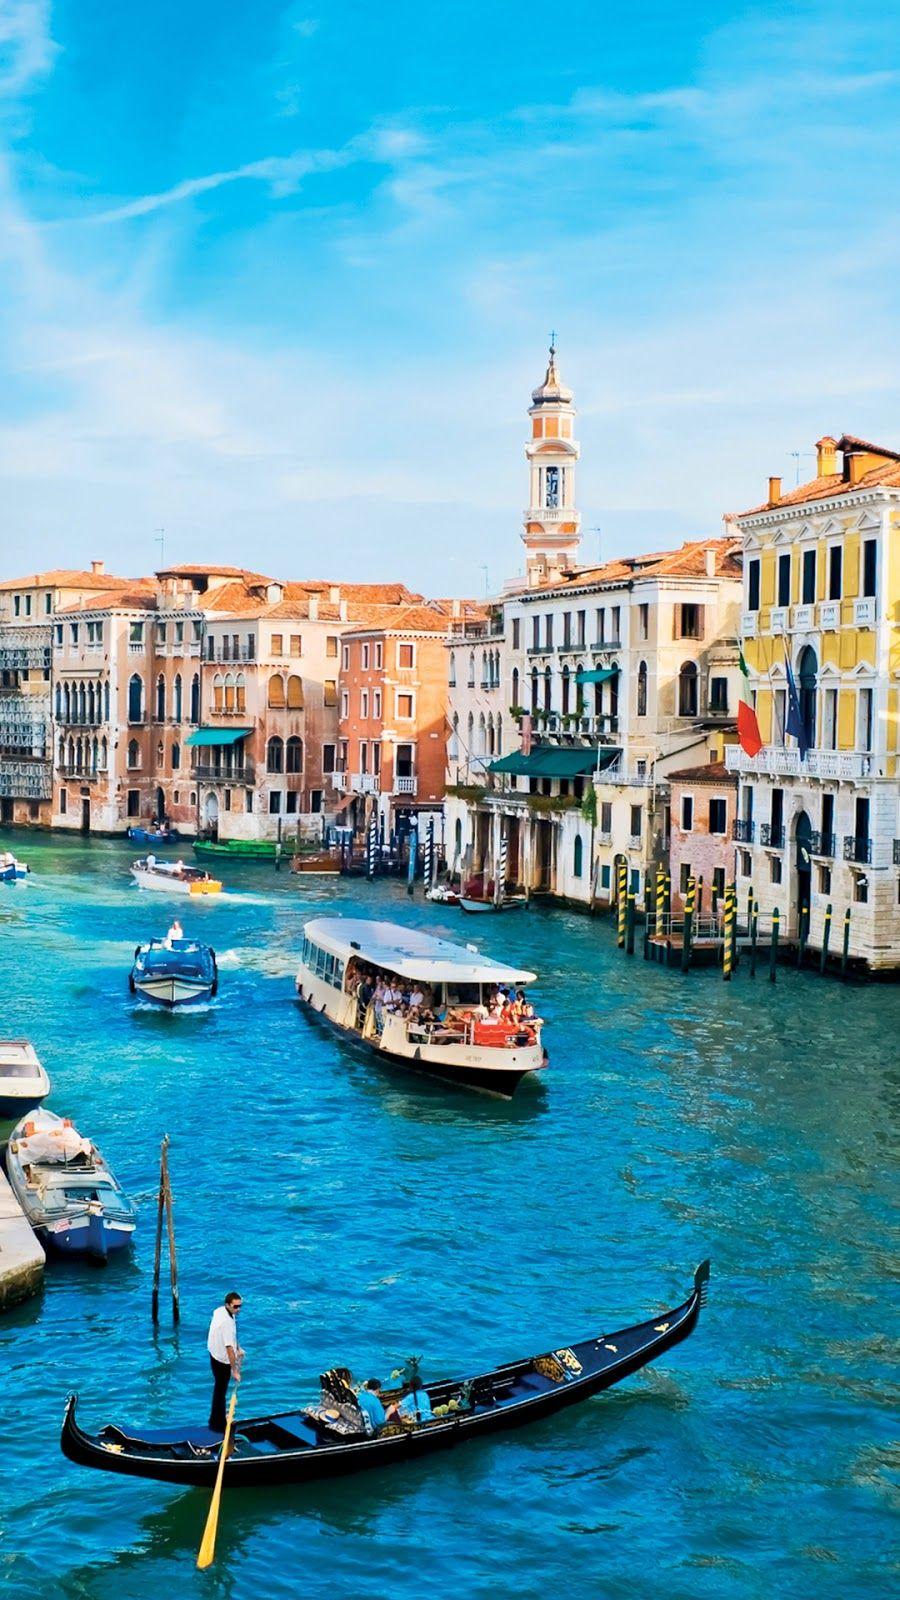 Venice City Mobile Wallpaper Gondola Italy Venice Wallpaper Venice City Venice Photography